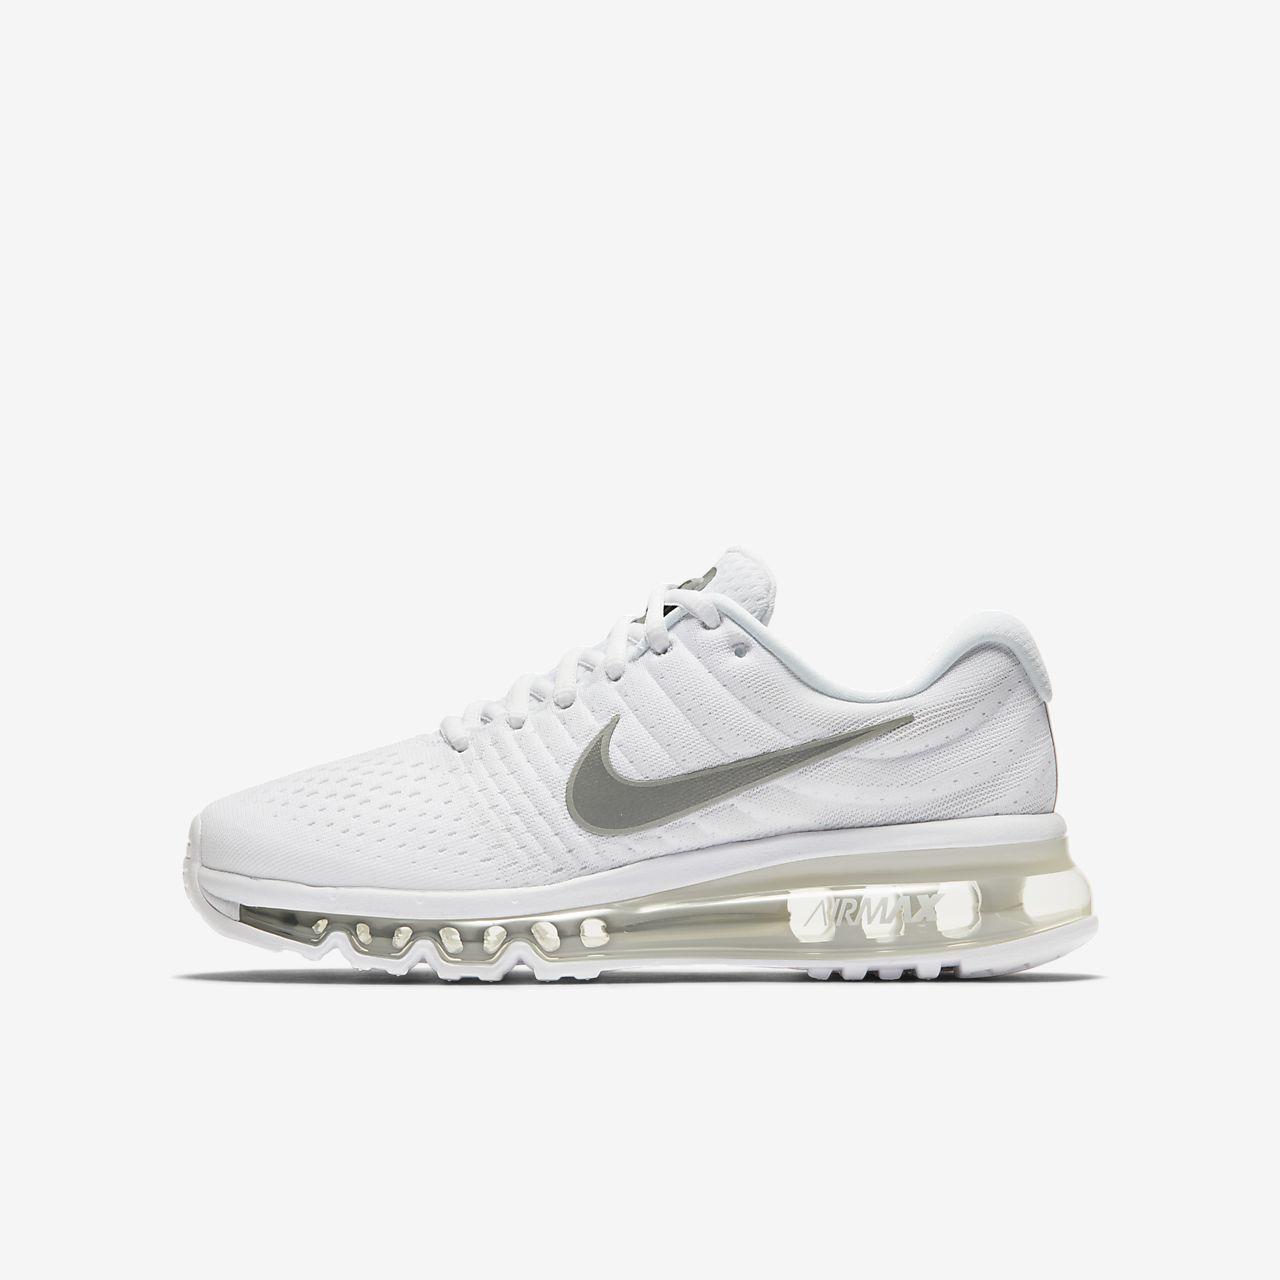 separation shoes dada5 78935 ... Nike Air Max 2017 Schuh für ältere Kinder